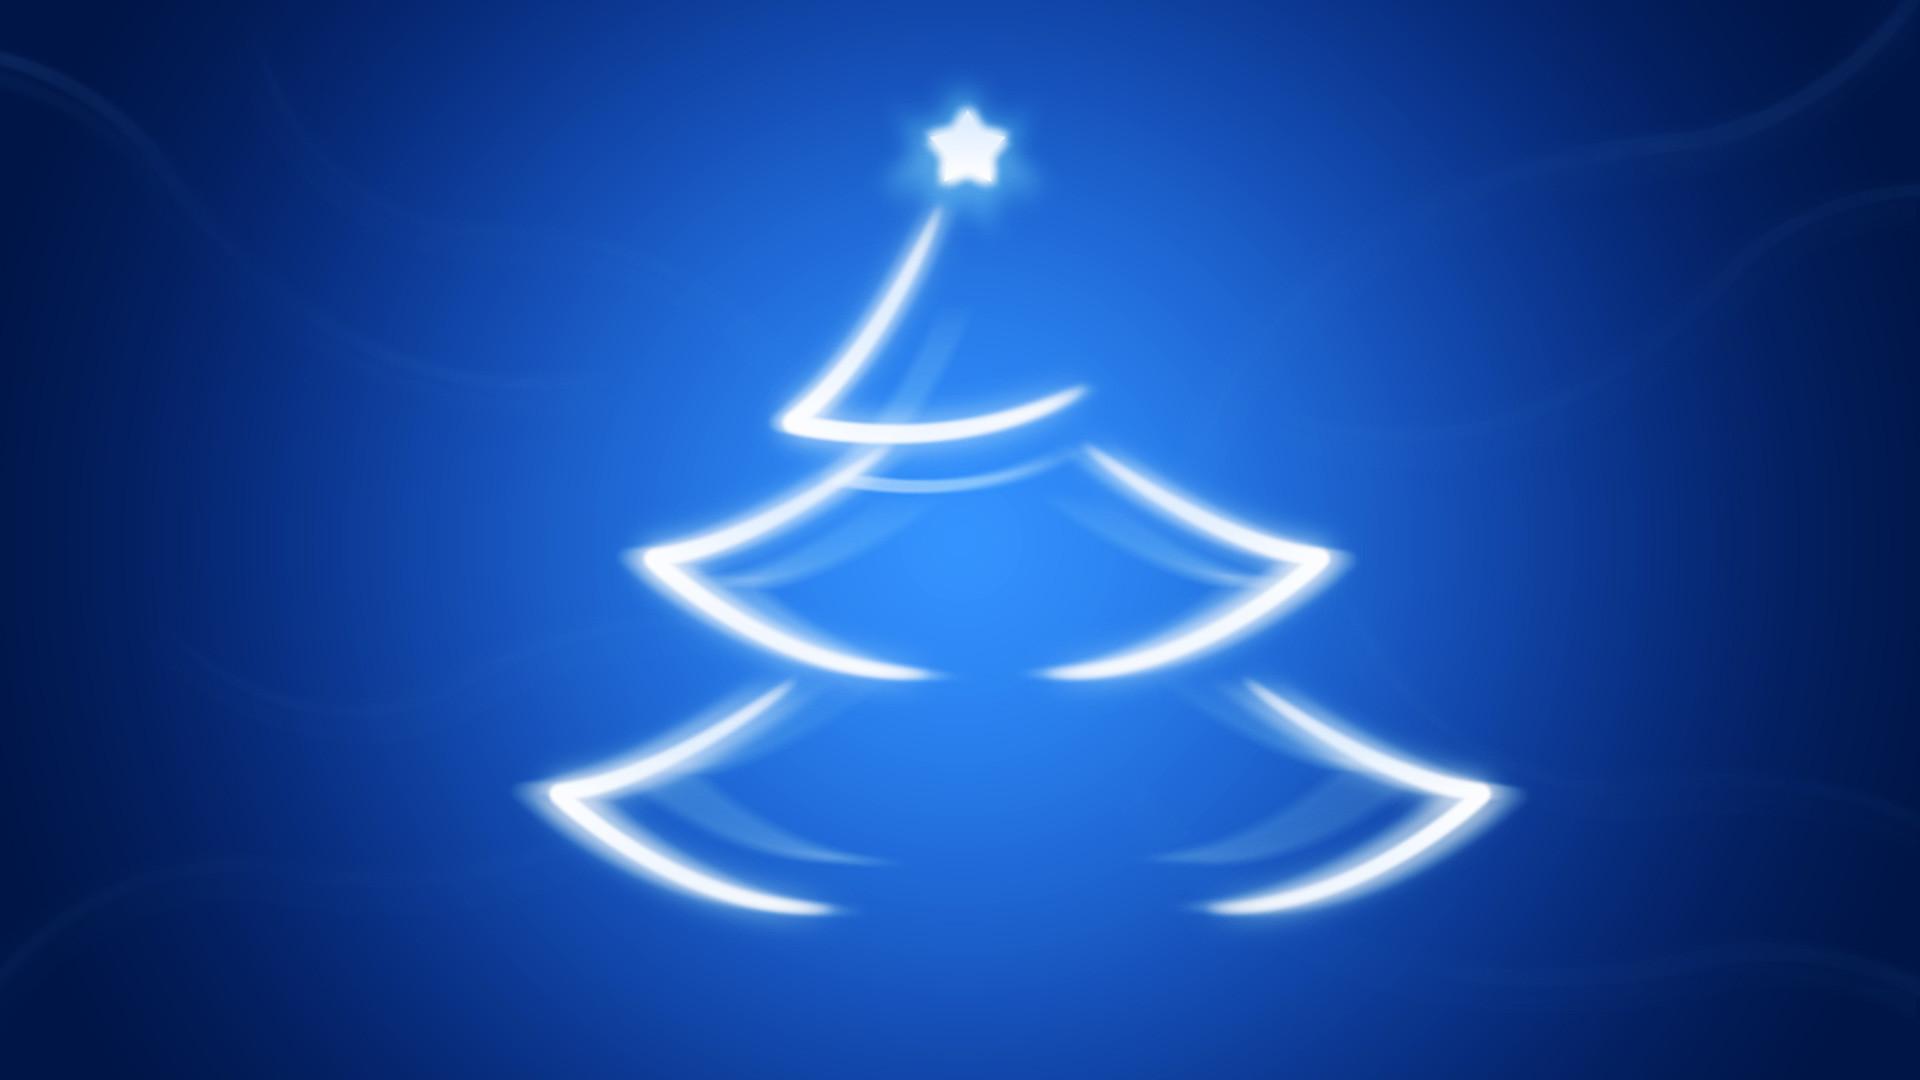 Christmas tree wallpaper HD free download